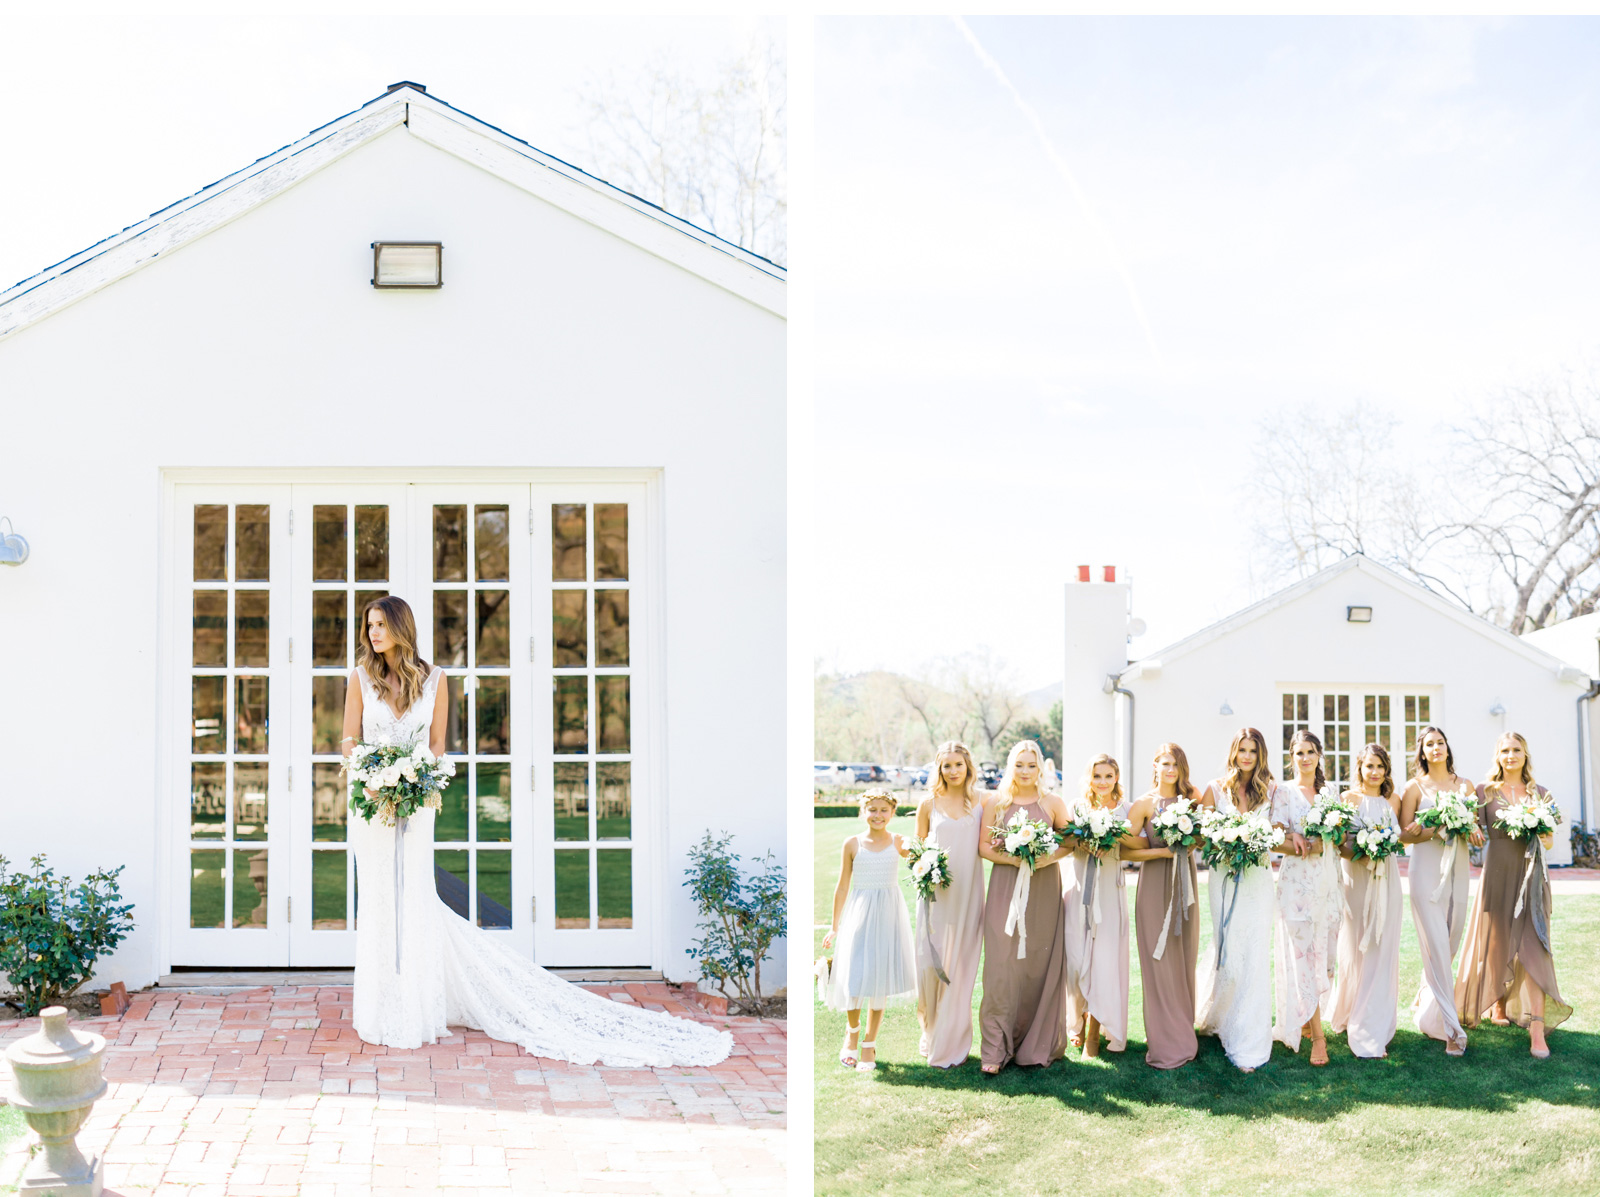 Malibu-Wedding-Photographer-Dani-Piercy-Inspired-by-This-Triunfo-Creek-Wedding-Natalie-Schutt-Photography_07.jpg